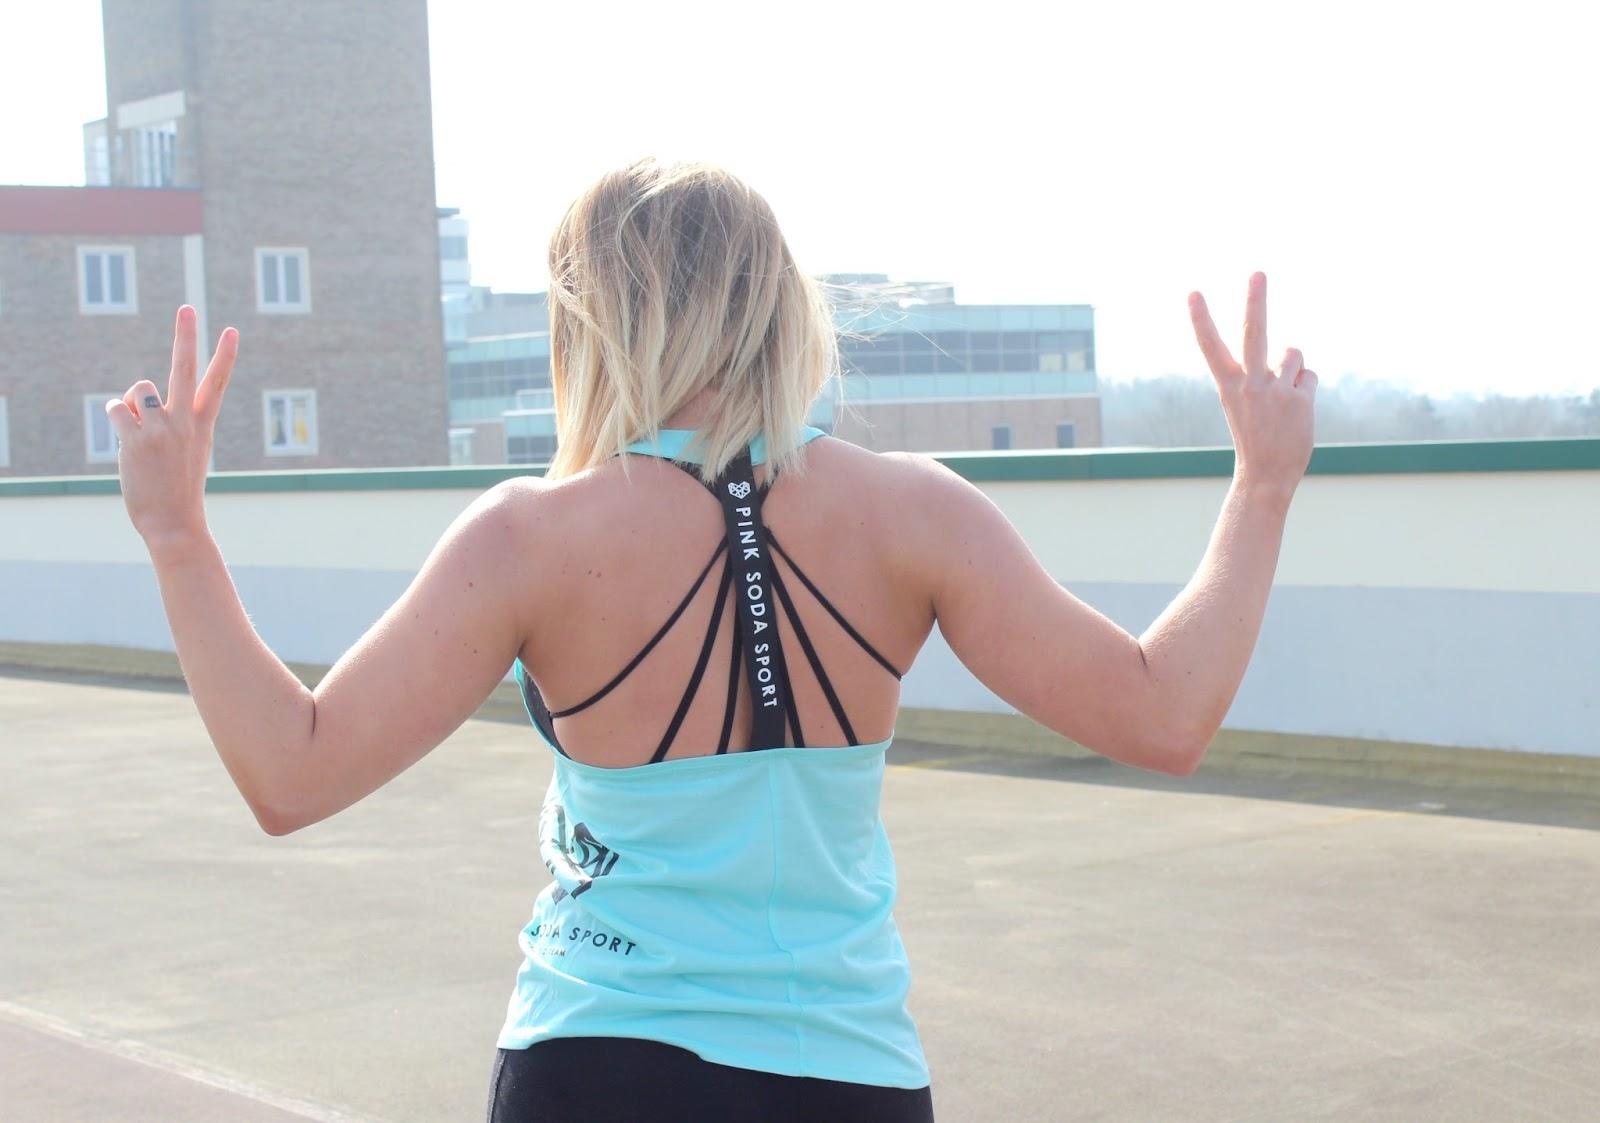 copper-garden-fitness-fashion-blogger-london-jessica-sheppard